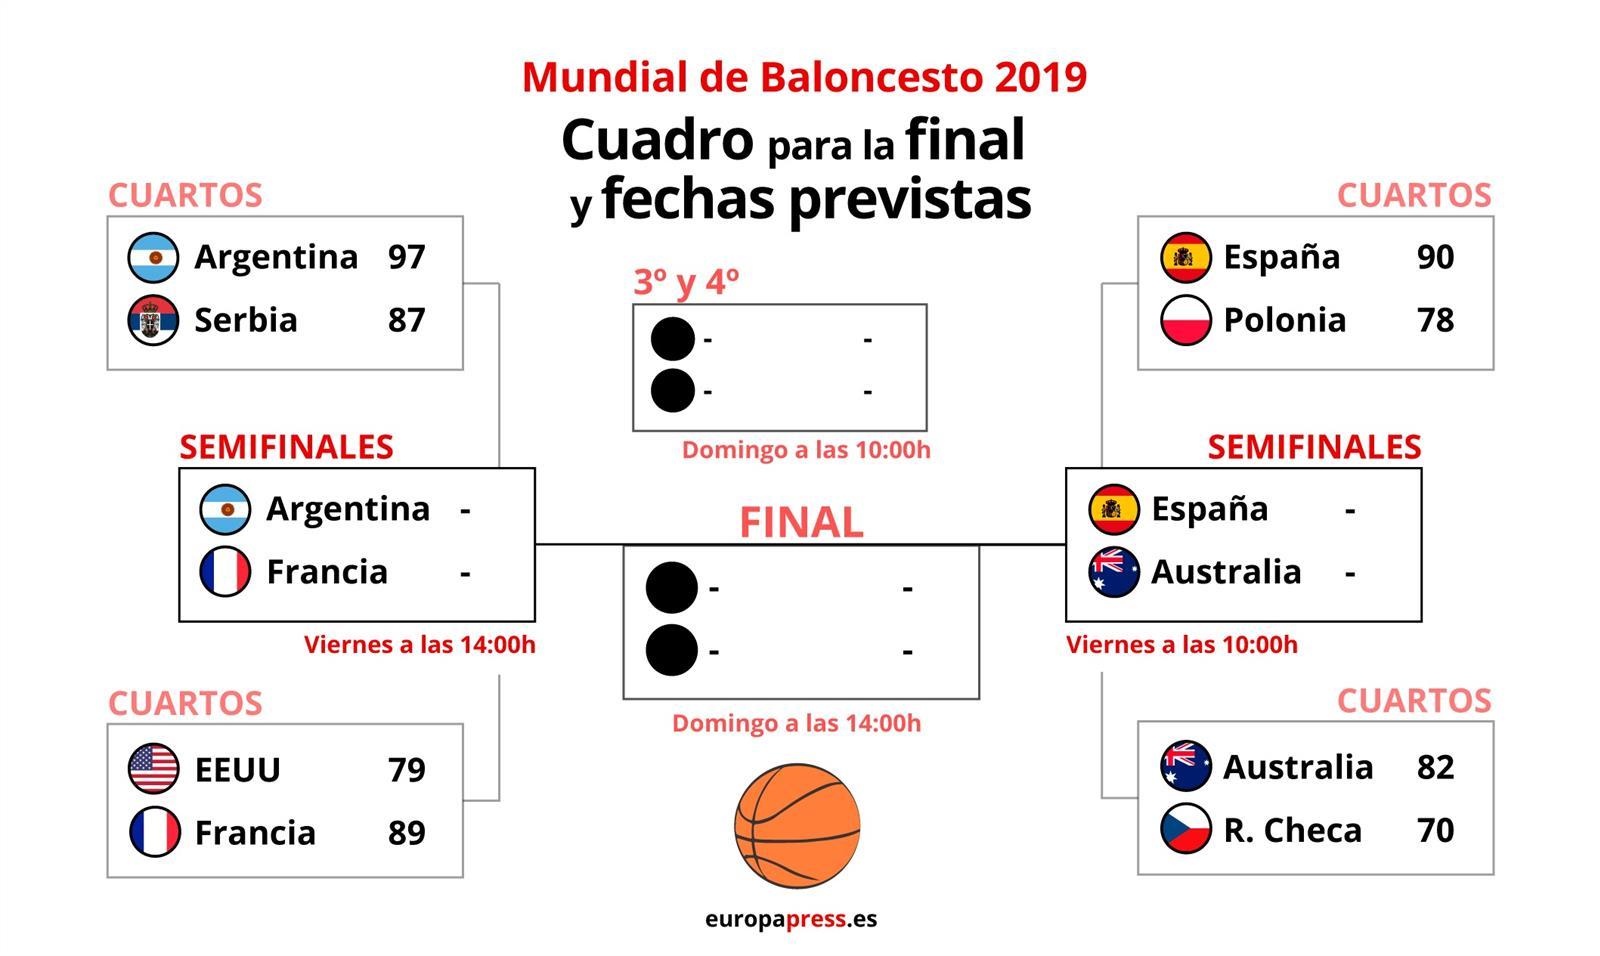 Cuadro final del Mundial de Baloncesto de China